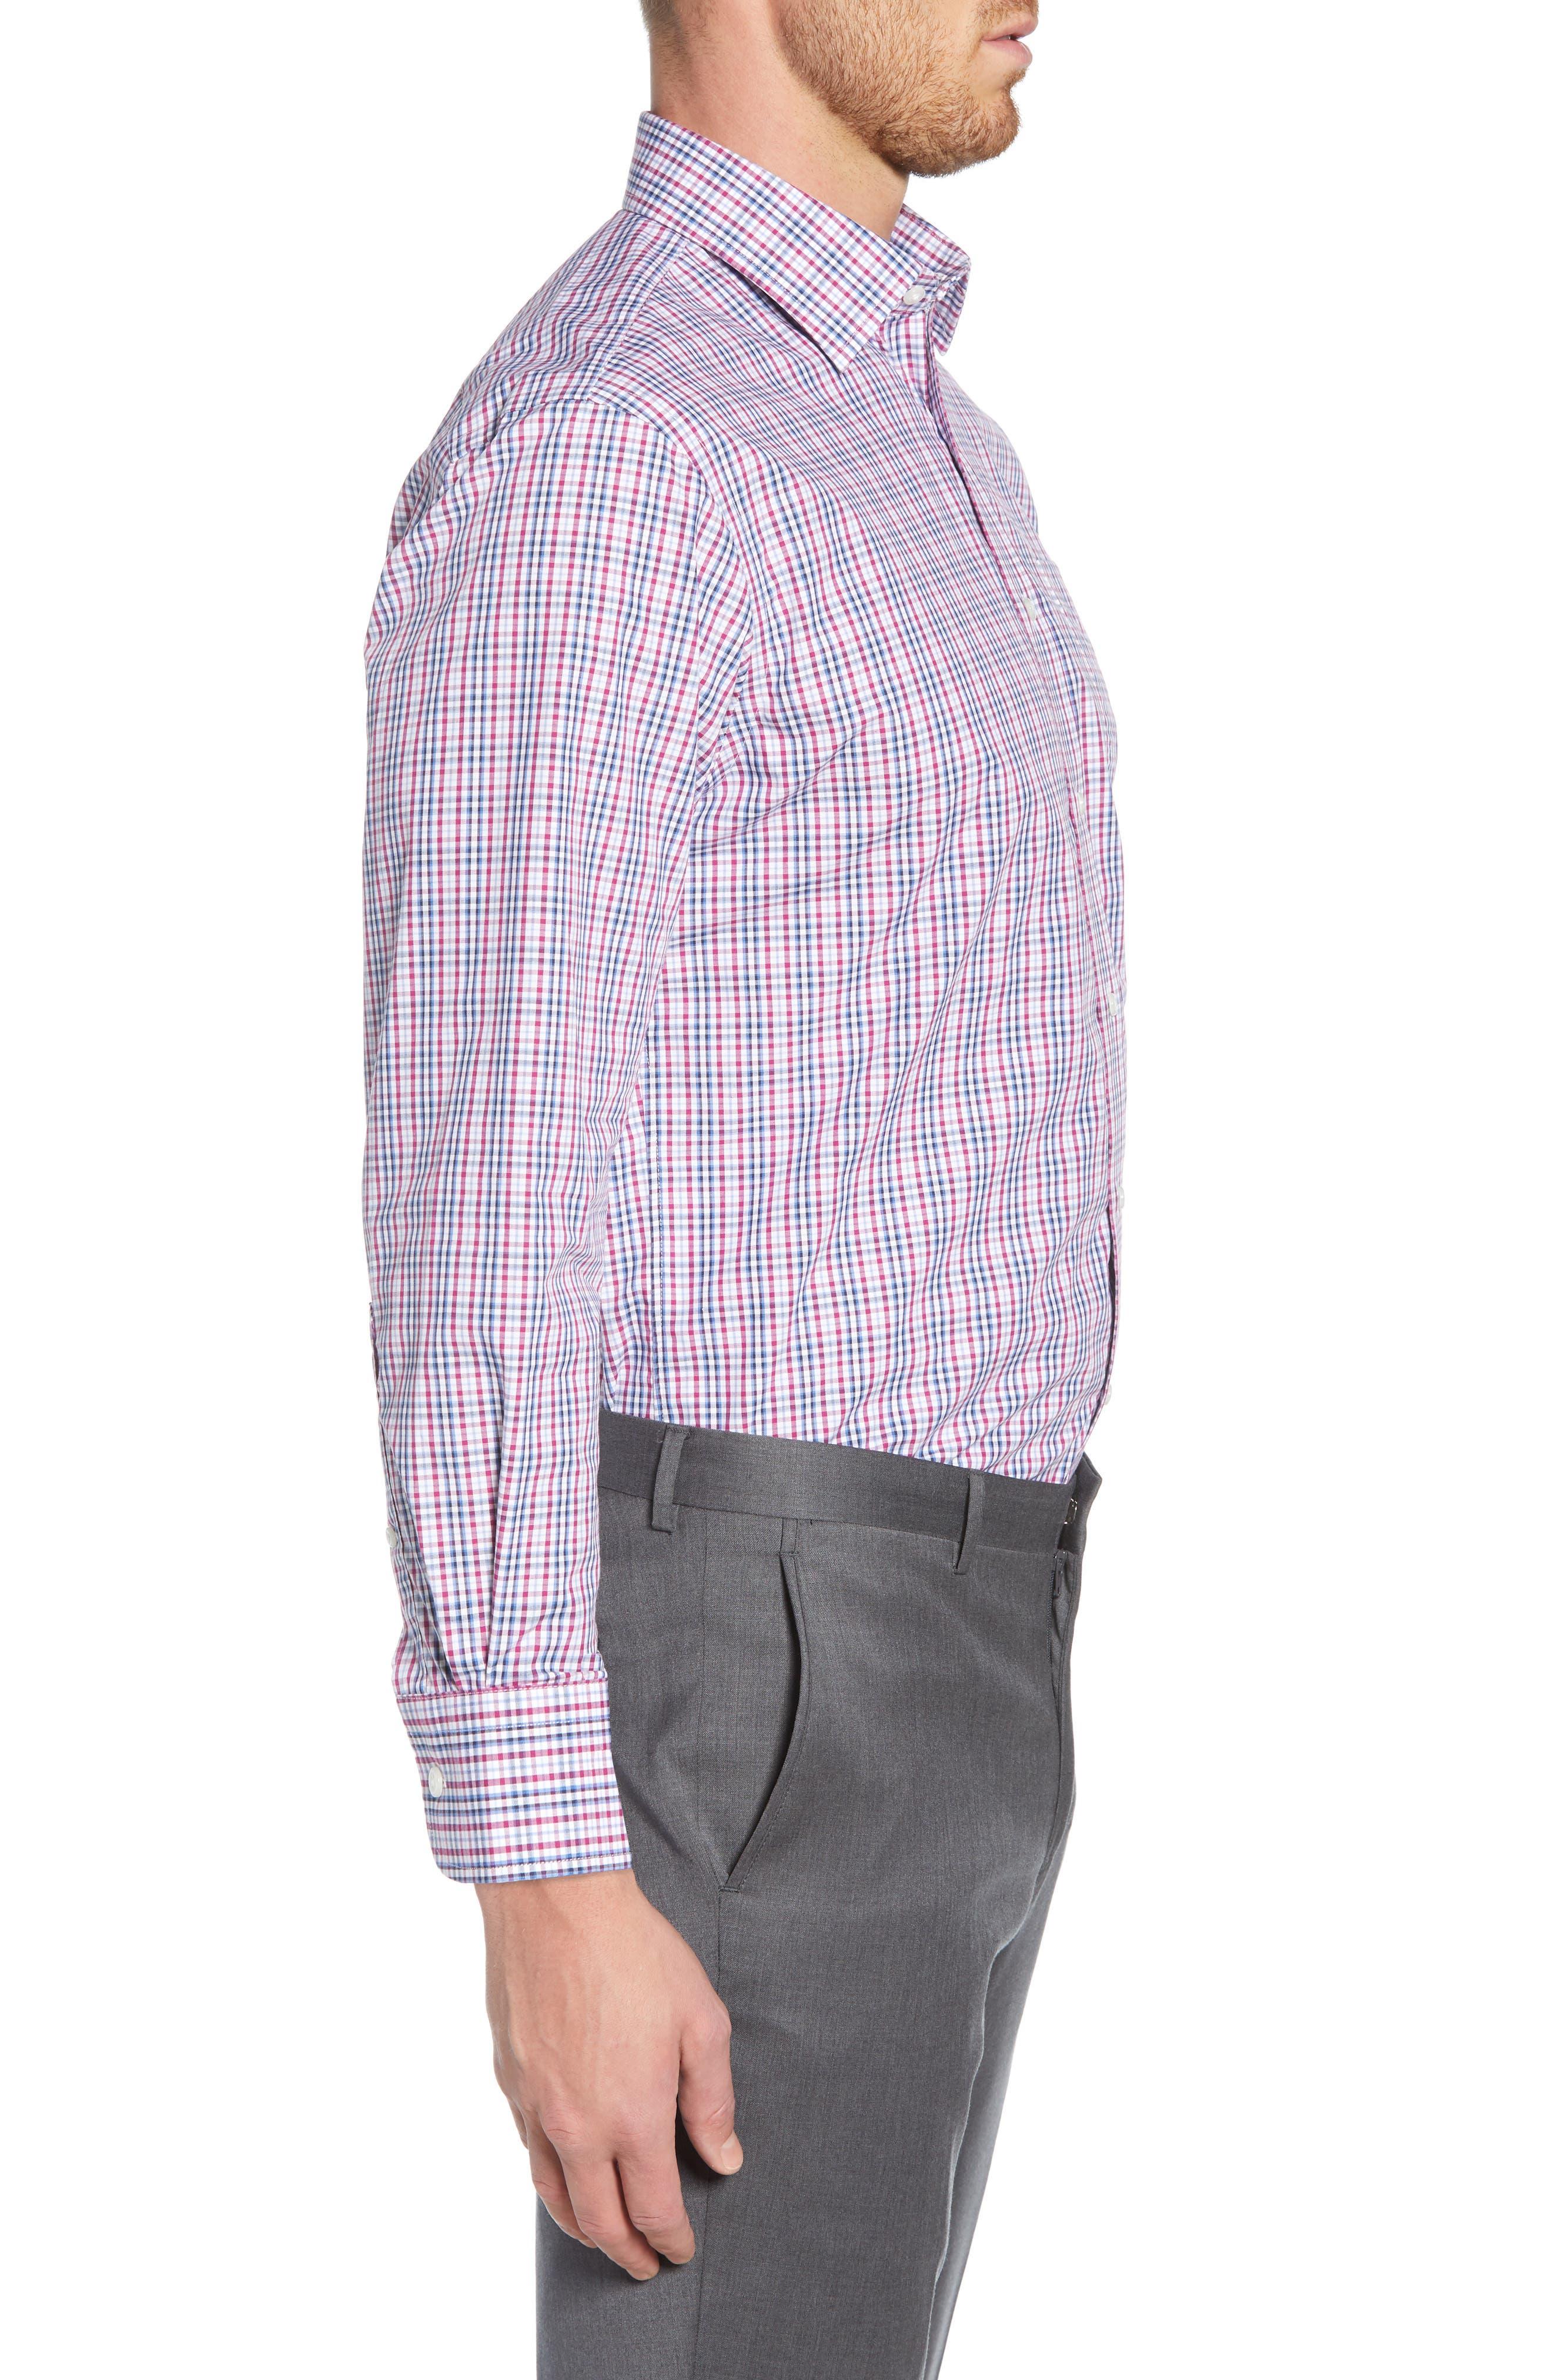 NORDSTROM MEN'S SHOP, Traditional Fit Non-Iron Plaid Dress Shirt, Alternate thumbnail 4, color, PURPLE BOYSEN